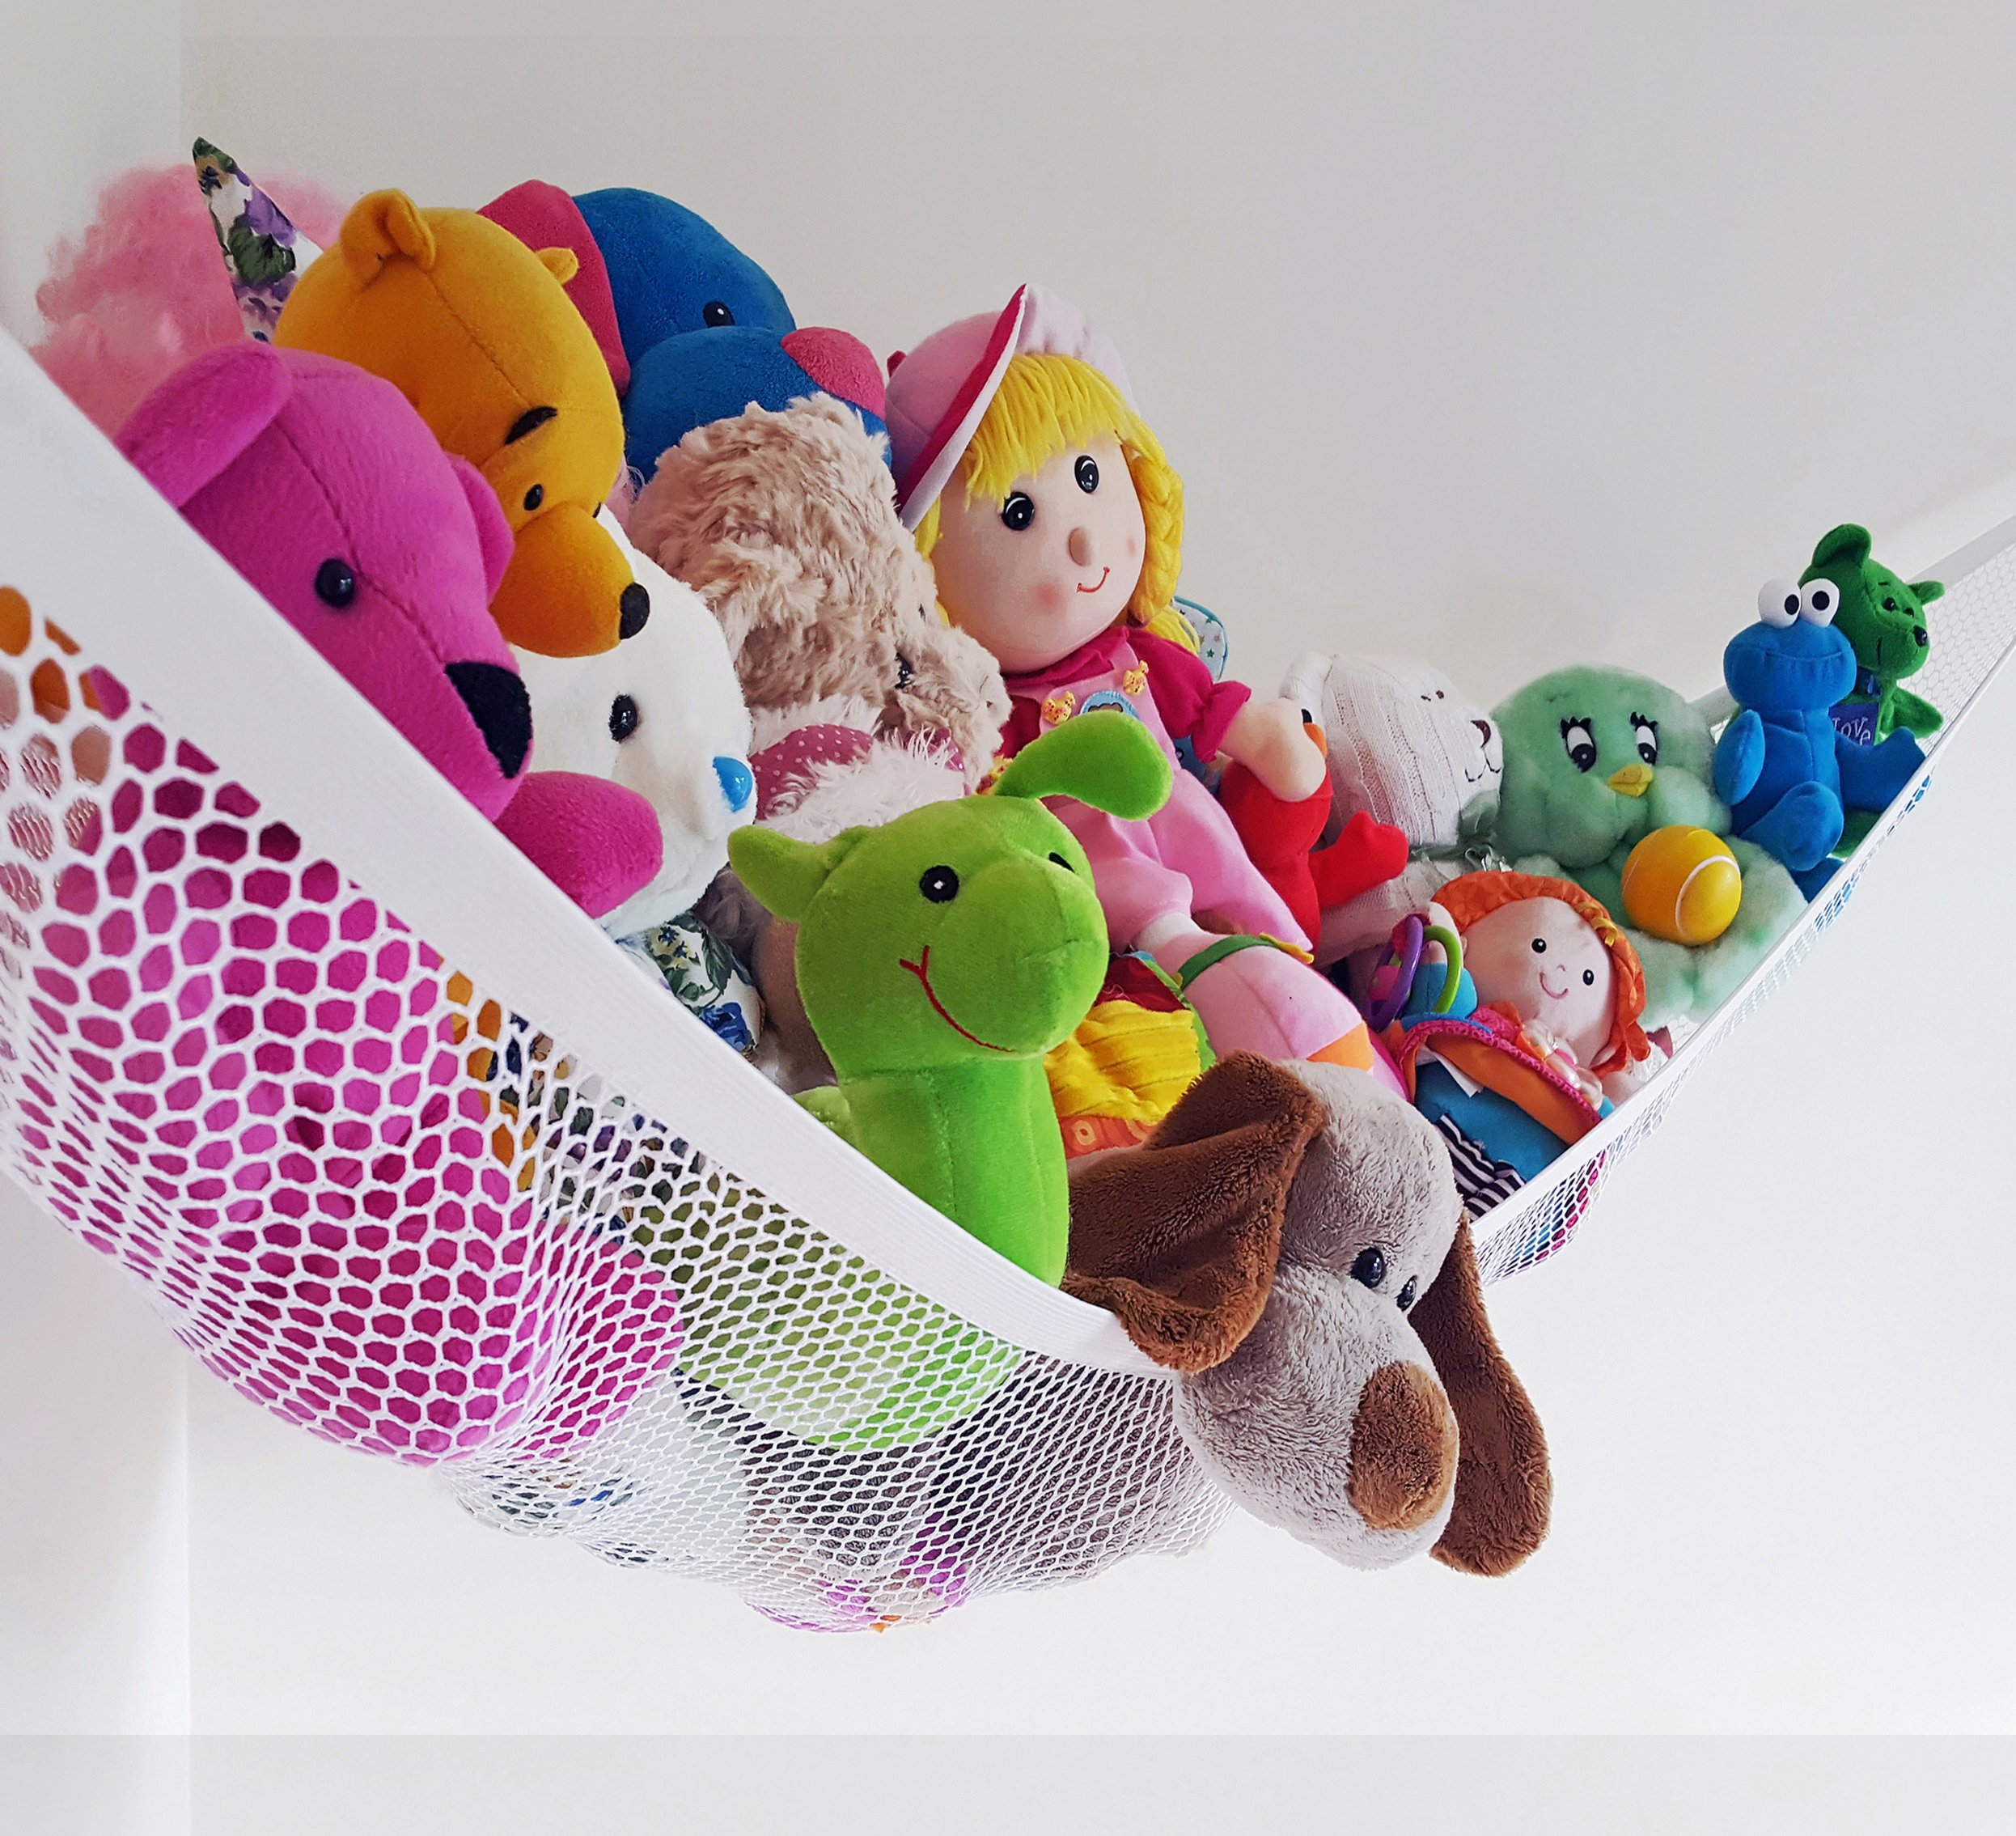 Stuffed Animal Hammock – TIDY TOYS EASILY – DELUXE Toy Hammock - LARGE White Pet Net 72 X 48 X 48 inch Hanging Nursery Toy Organizer, Kids Room Storage, Teens Or Adults Gear. By Viva Jumbo Toy Hammock